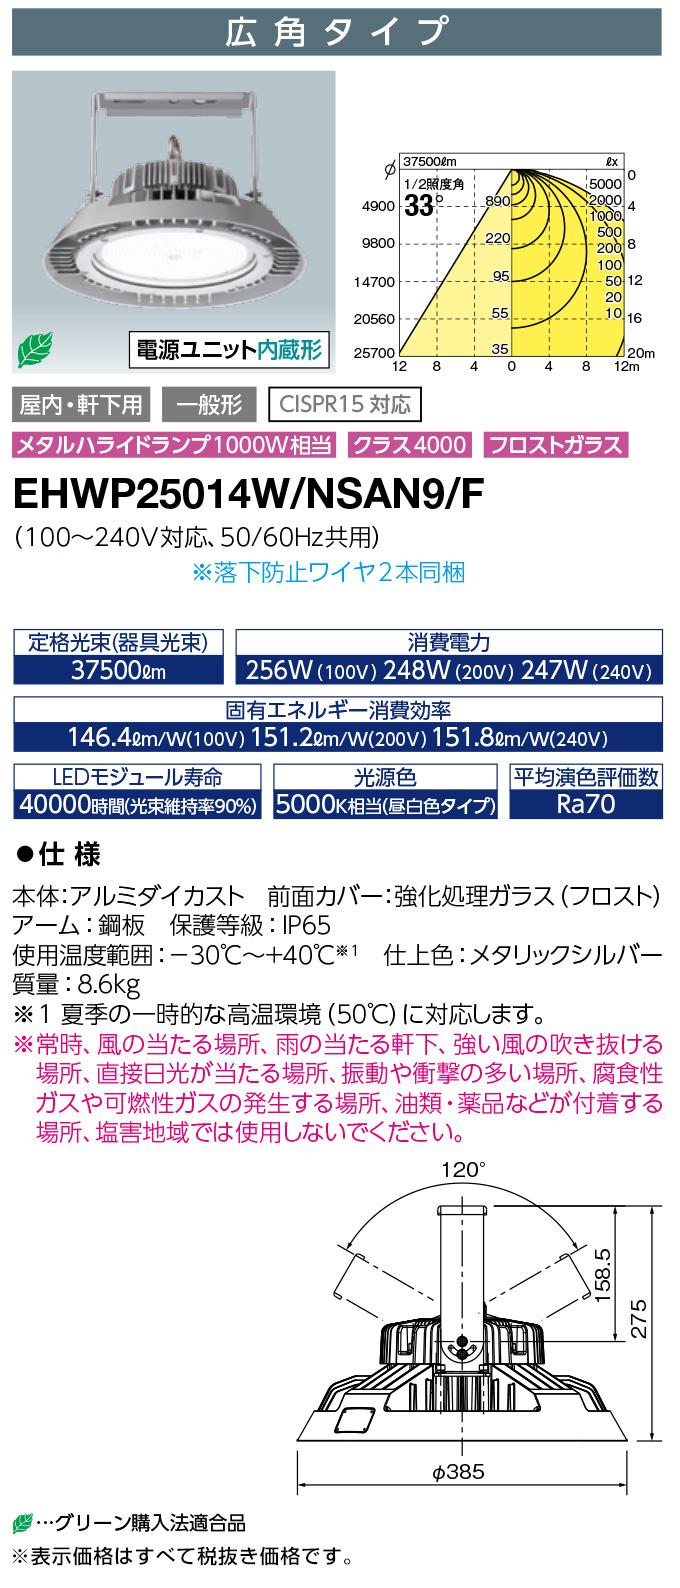 EHWP25014W/NSAN9/F